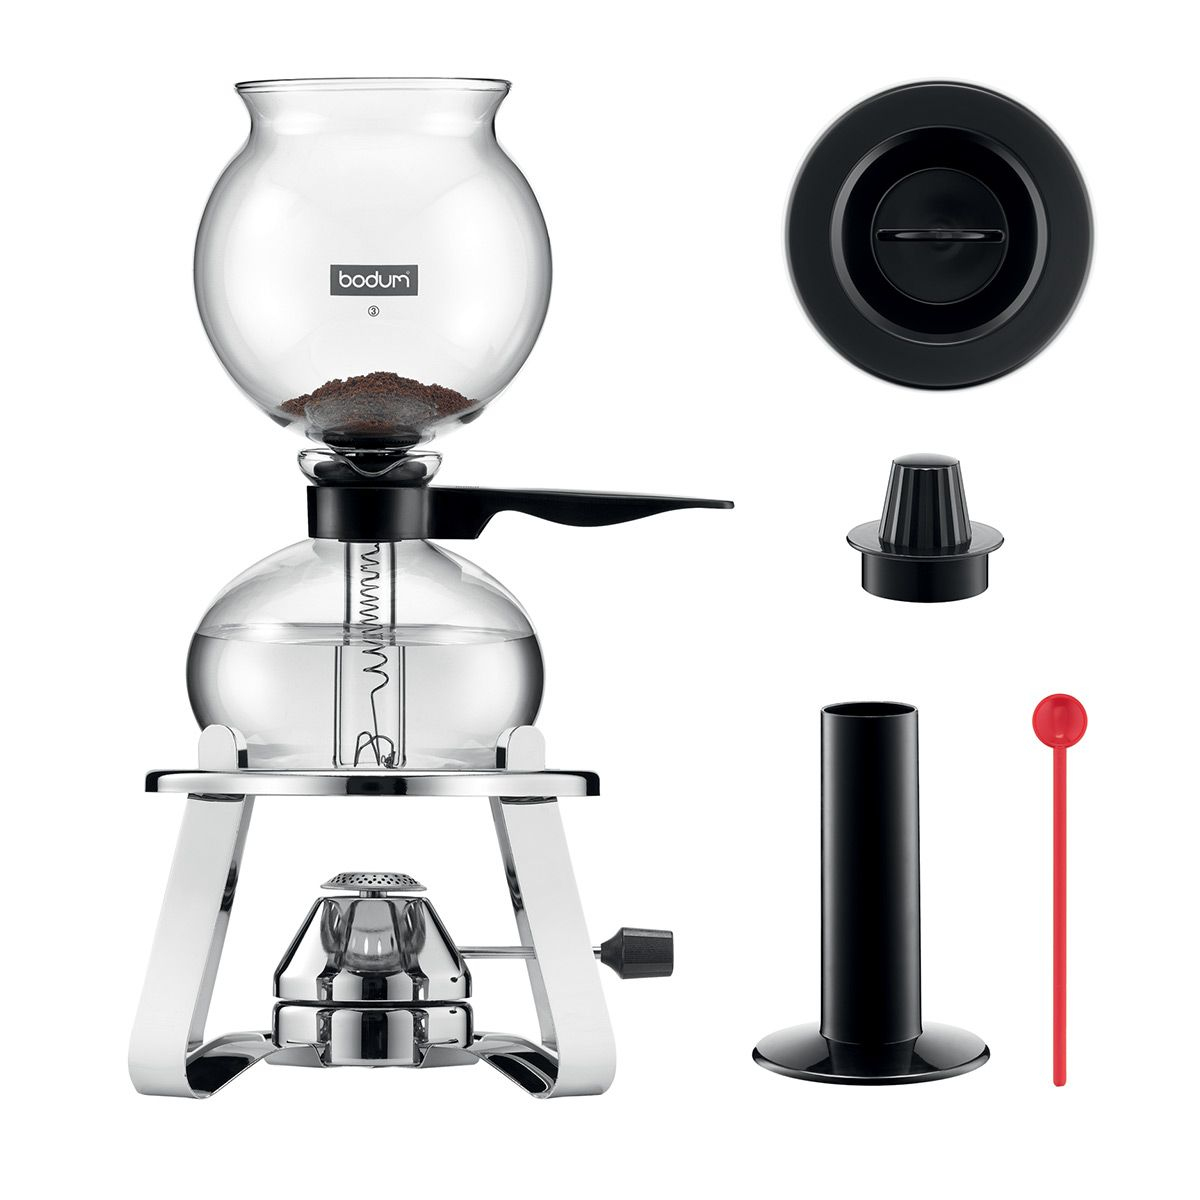 Vacuum Coffee Maker With Gas Burner PEBO Bodum